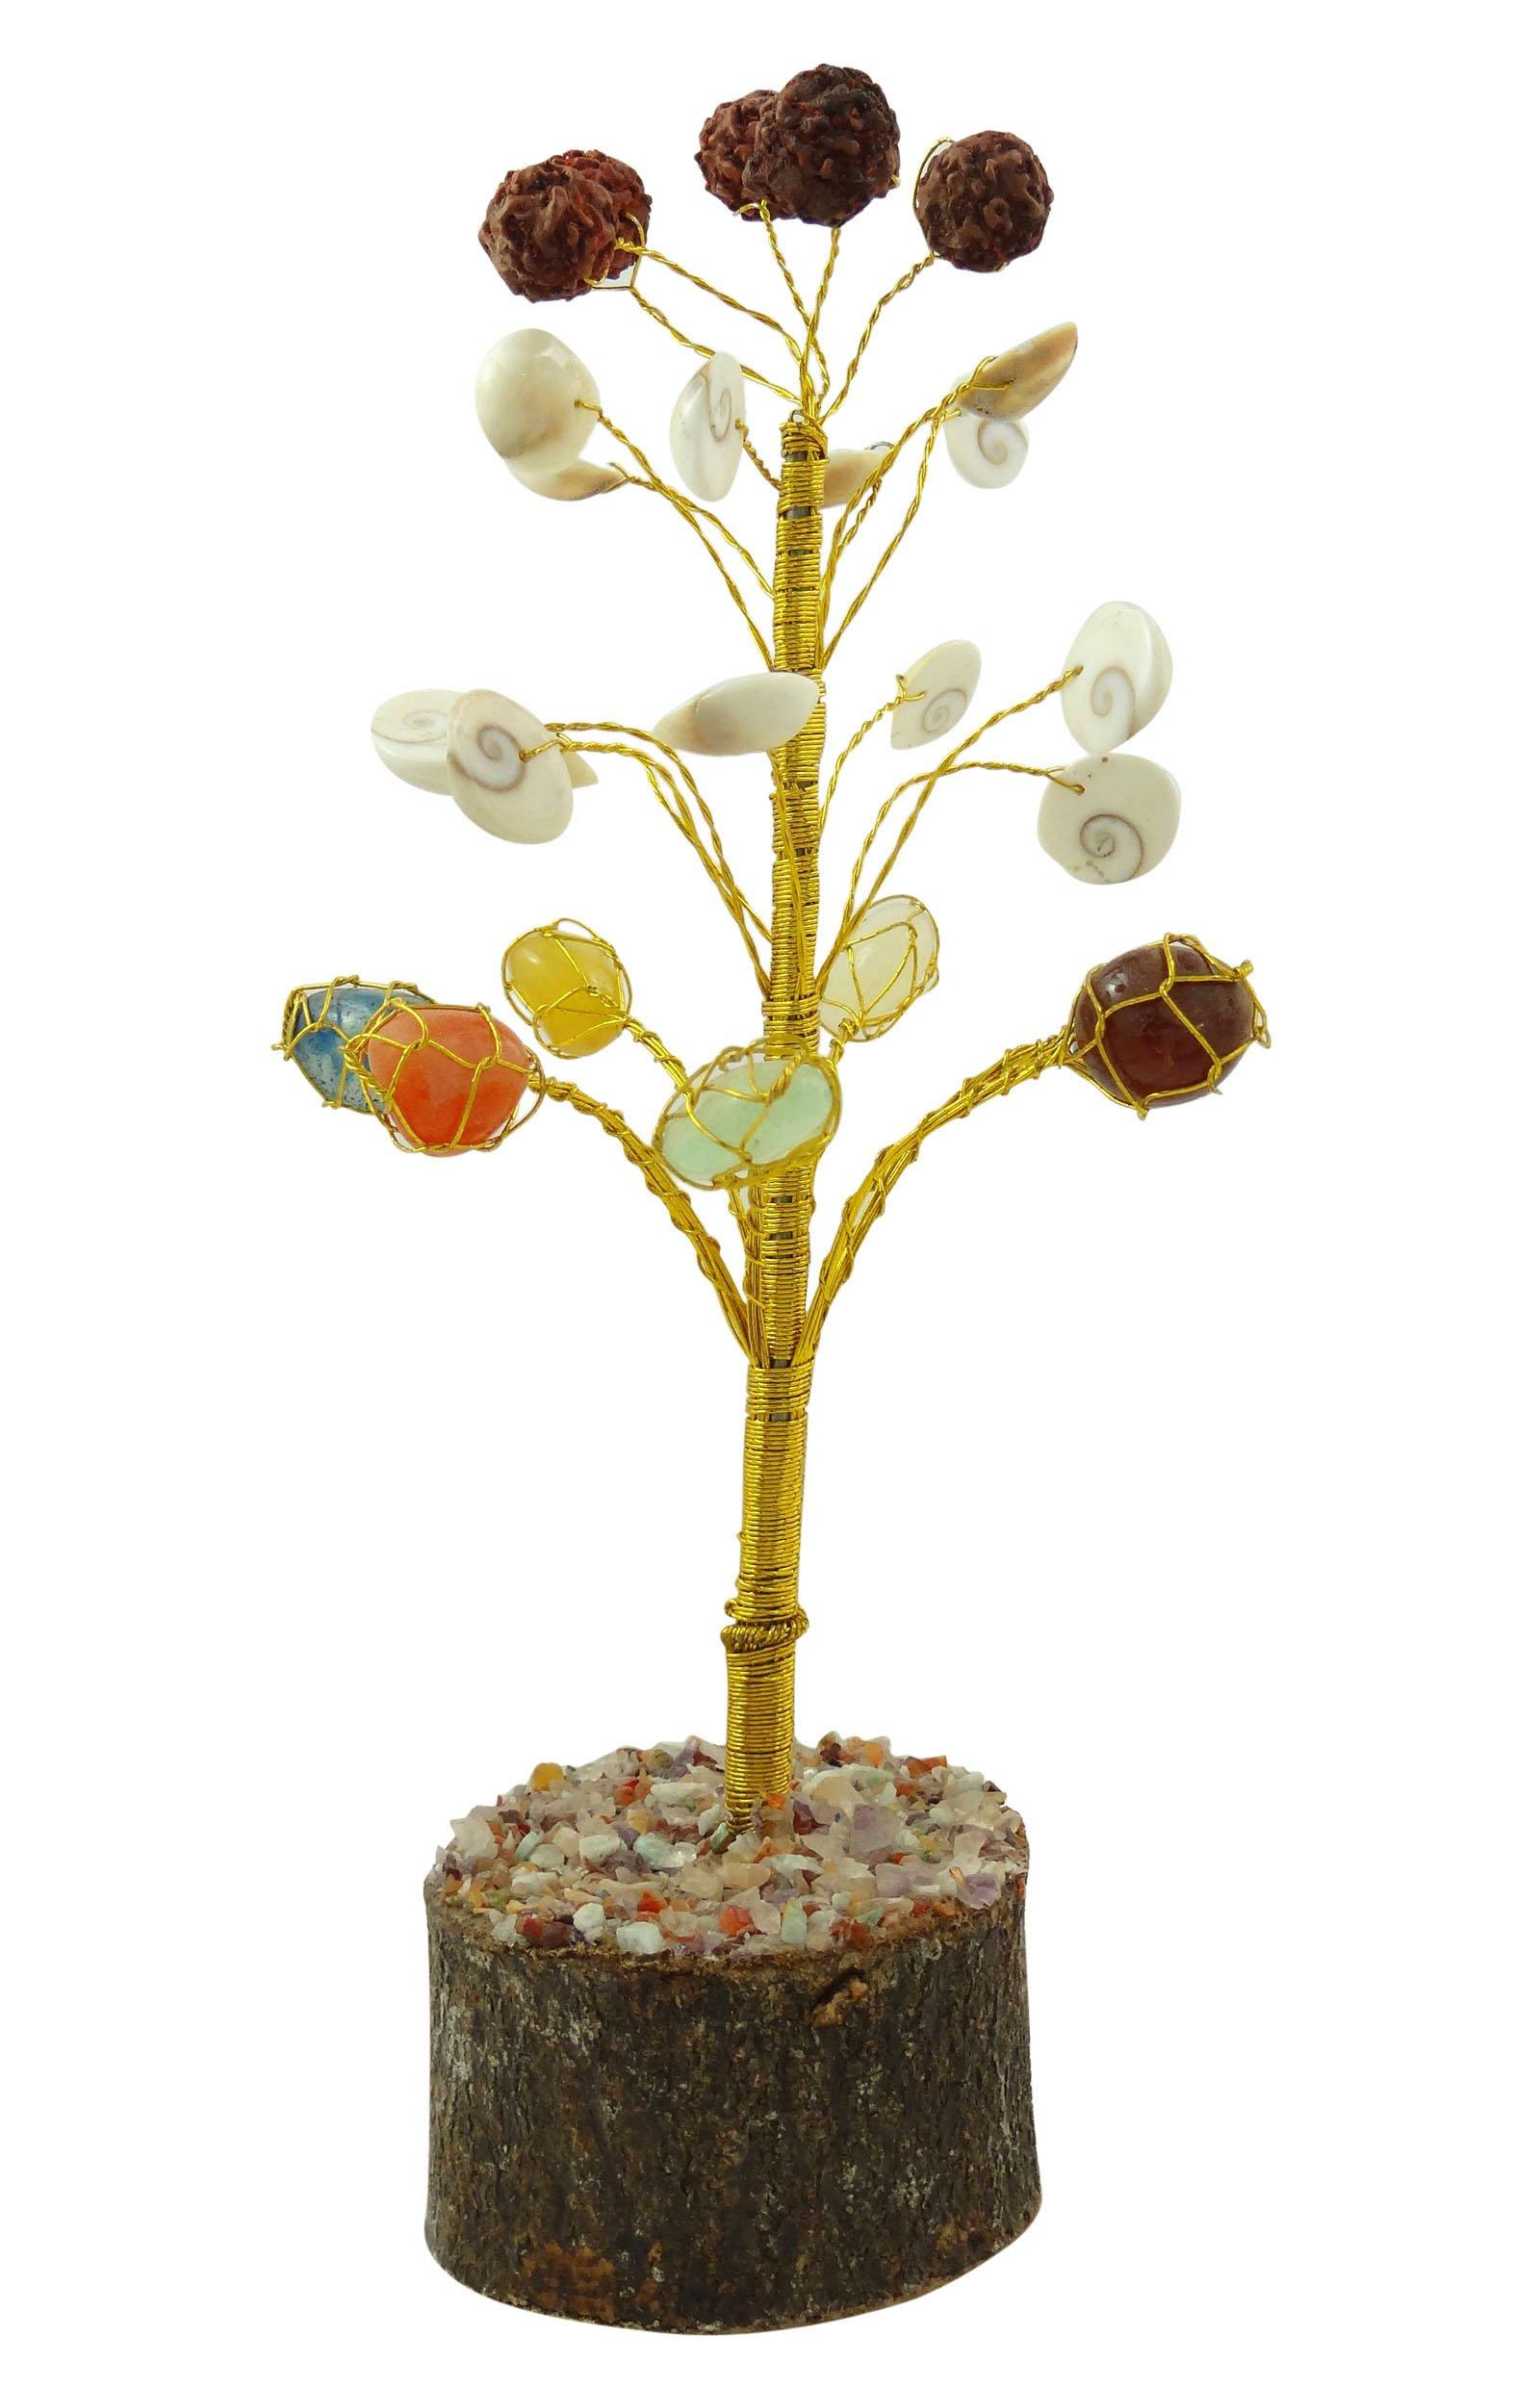 Harmonize Multistone Rudraksh Gomati Chakra Cowry Shells Power Reiki Healing Crystal Tree Spiritual Table Décor